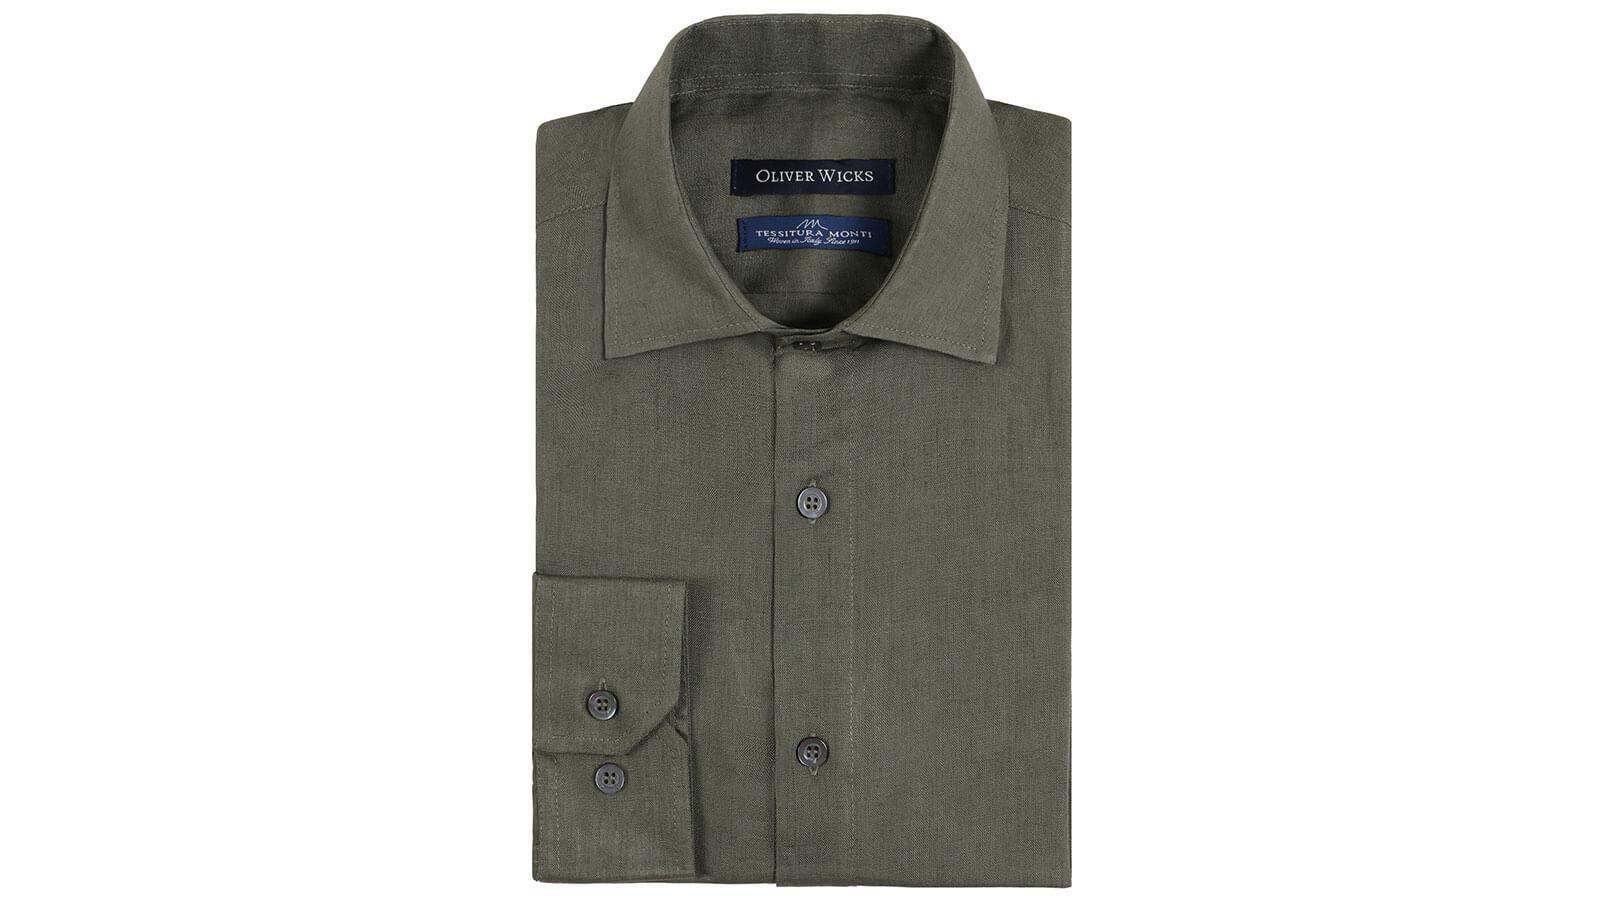 Forest Green Linen Shirt - slider image 1